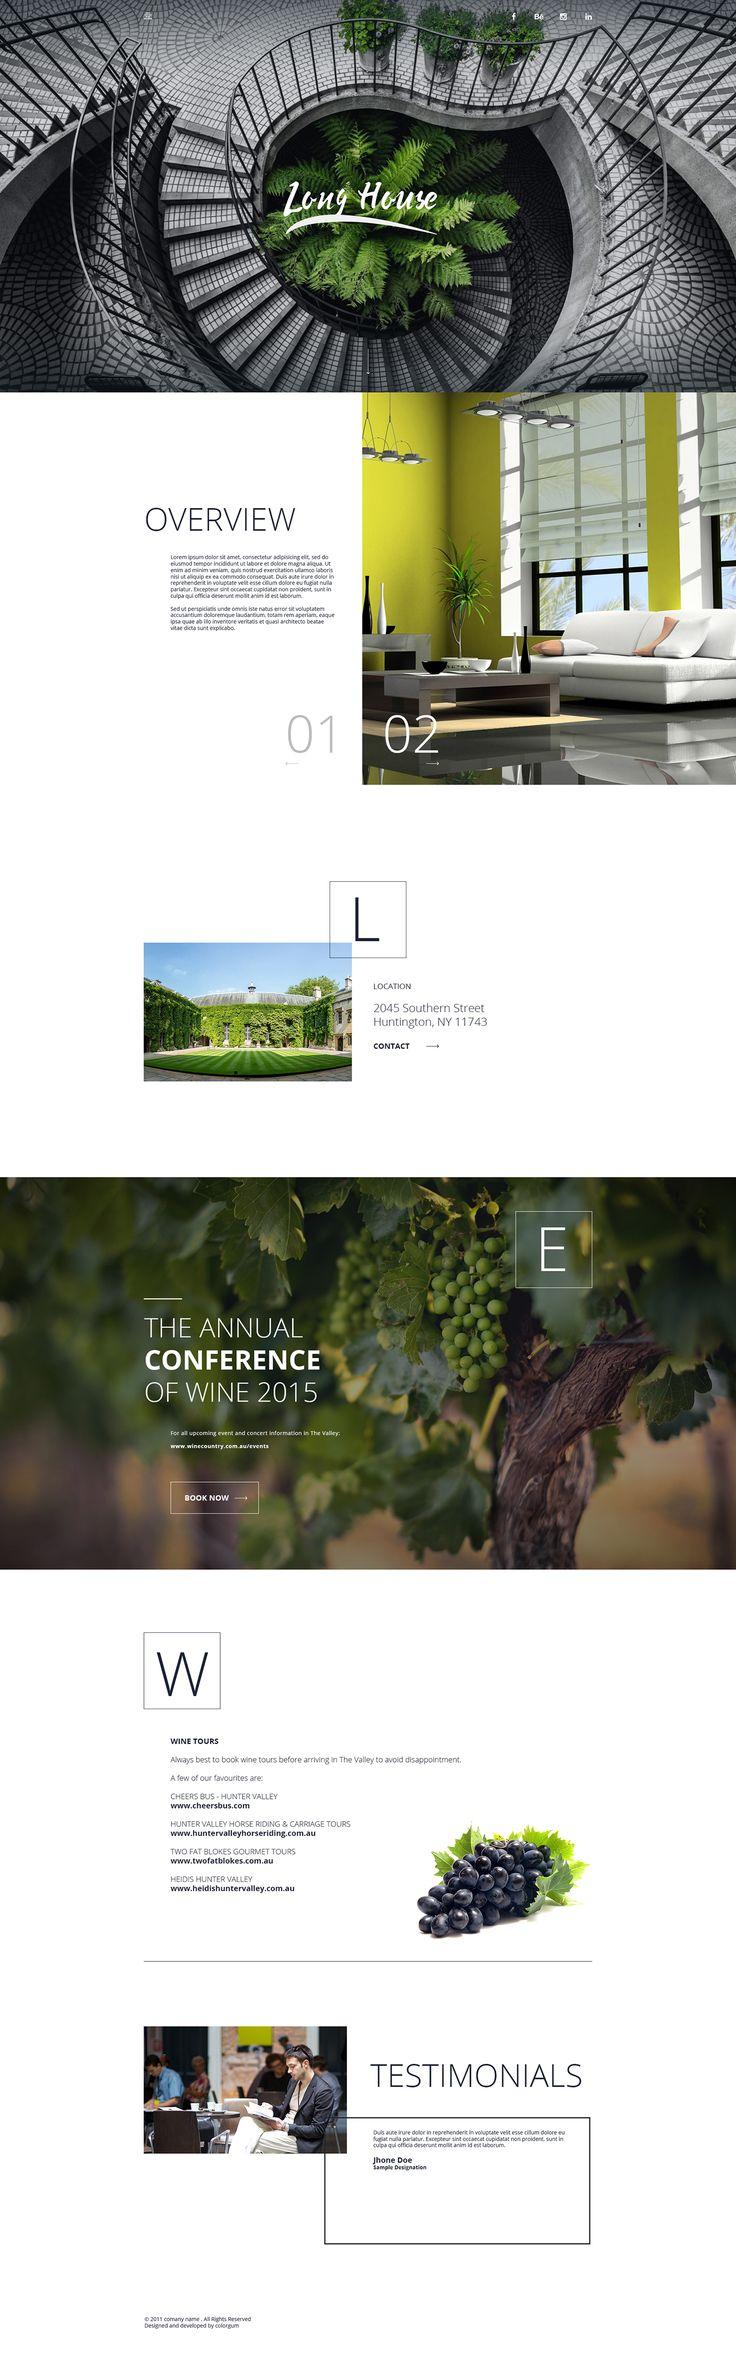 Free Home Page Design on Behance by Afanur Rashid Dhaka, Bangladesh